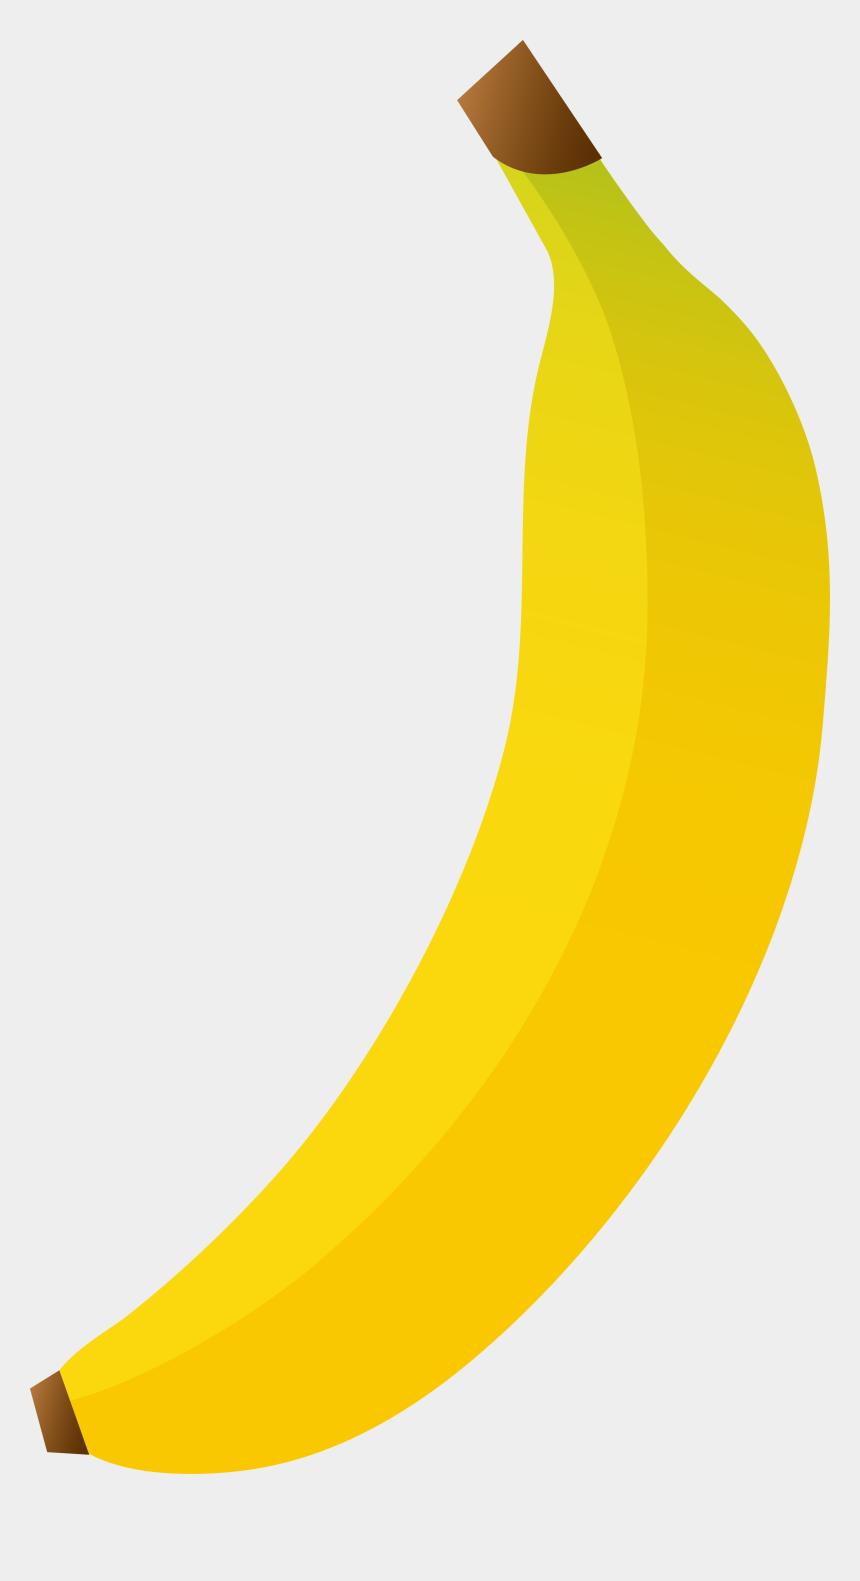 banana clip art, Cartoons - Banana Clipart - Transparent Background Banana Clipart Png